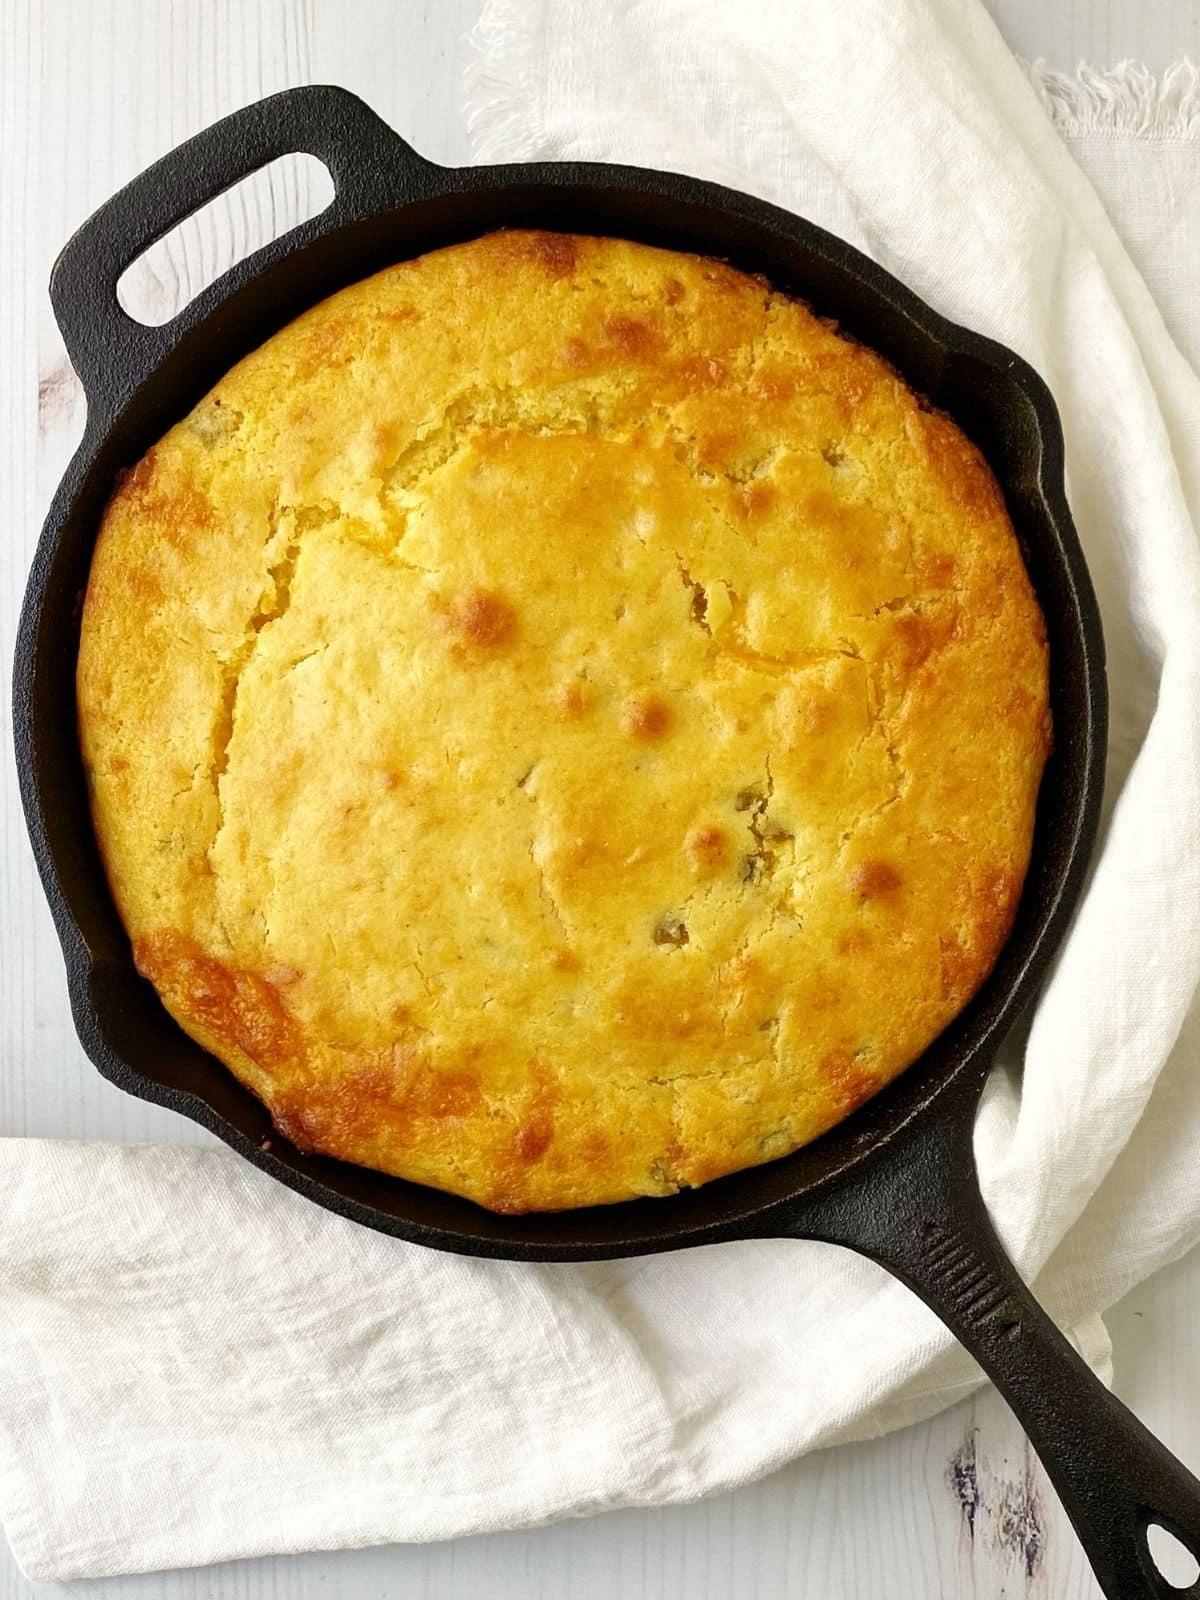 skillet of baked cornbread